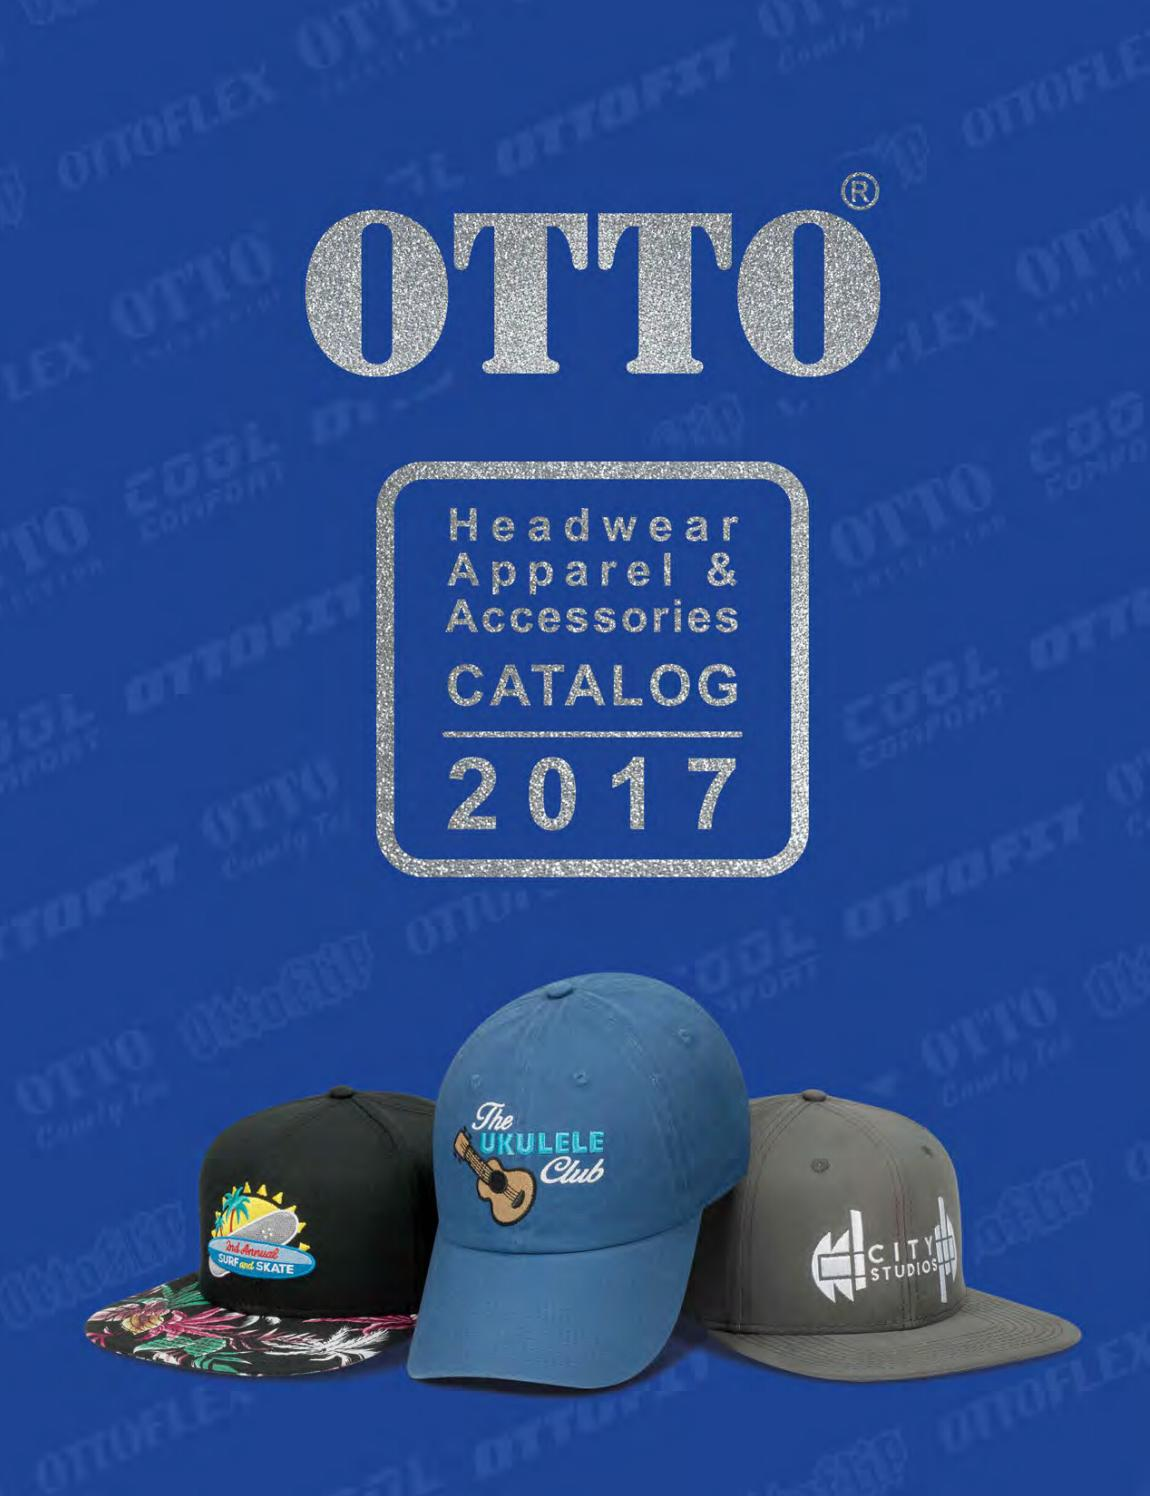 130de3b8 OTTO Cap 2017 catalog by OTTO International - issuu